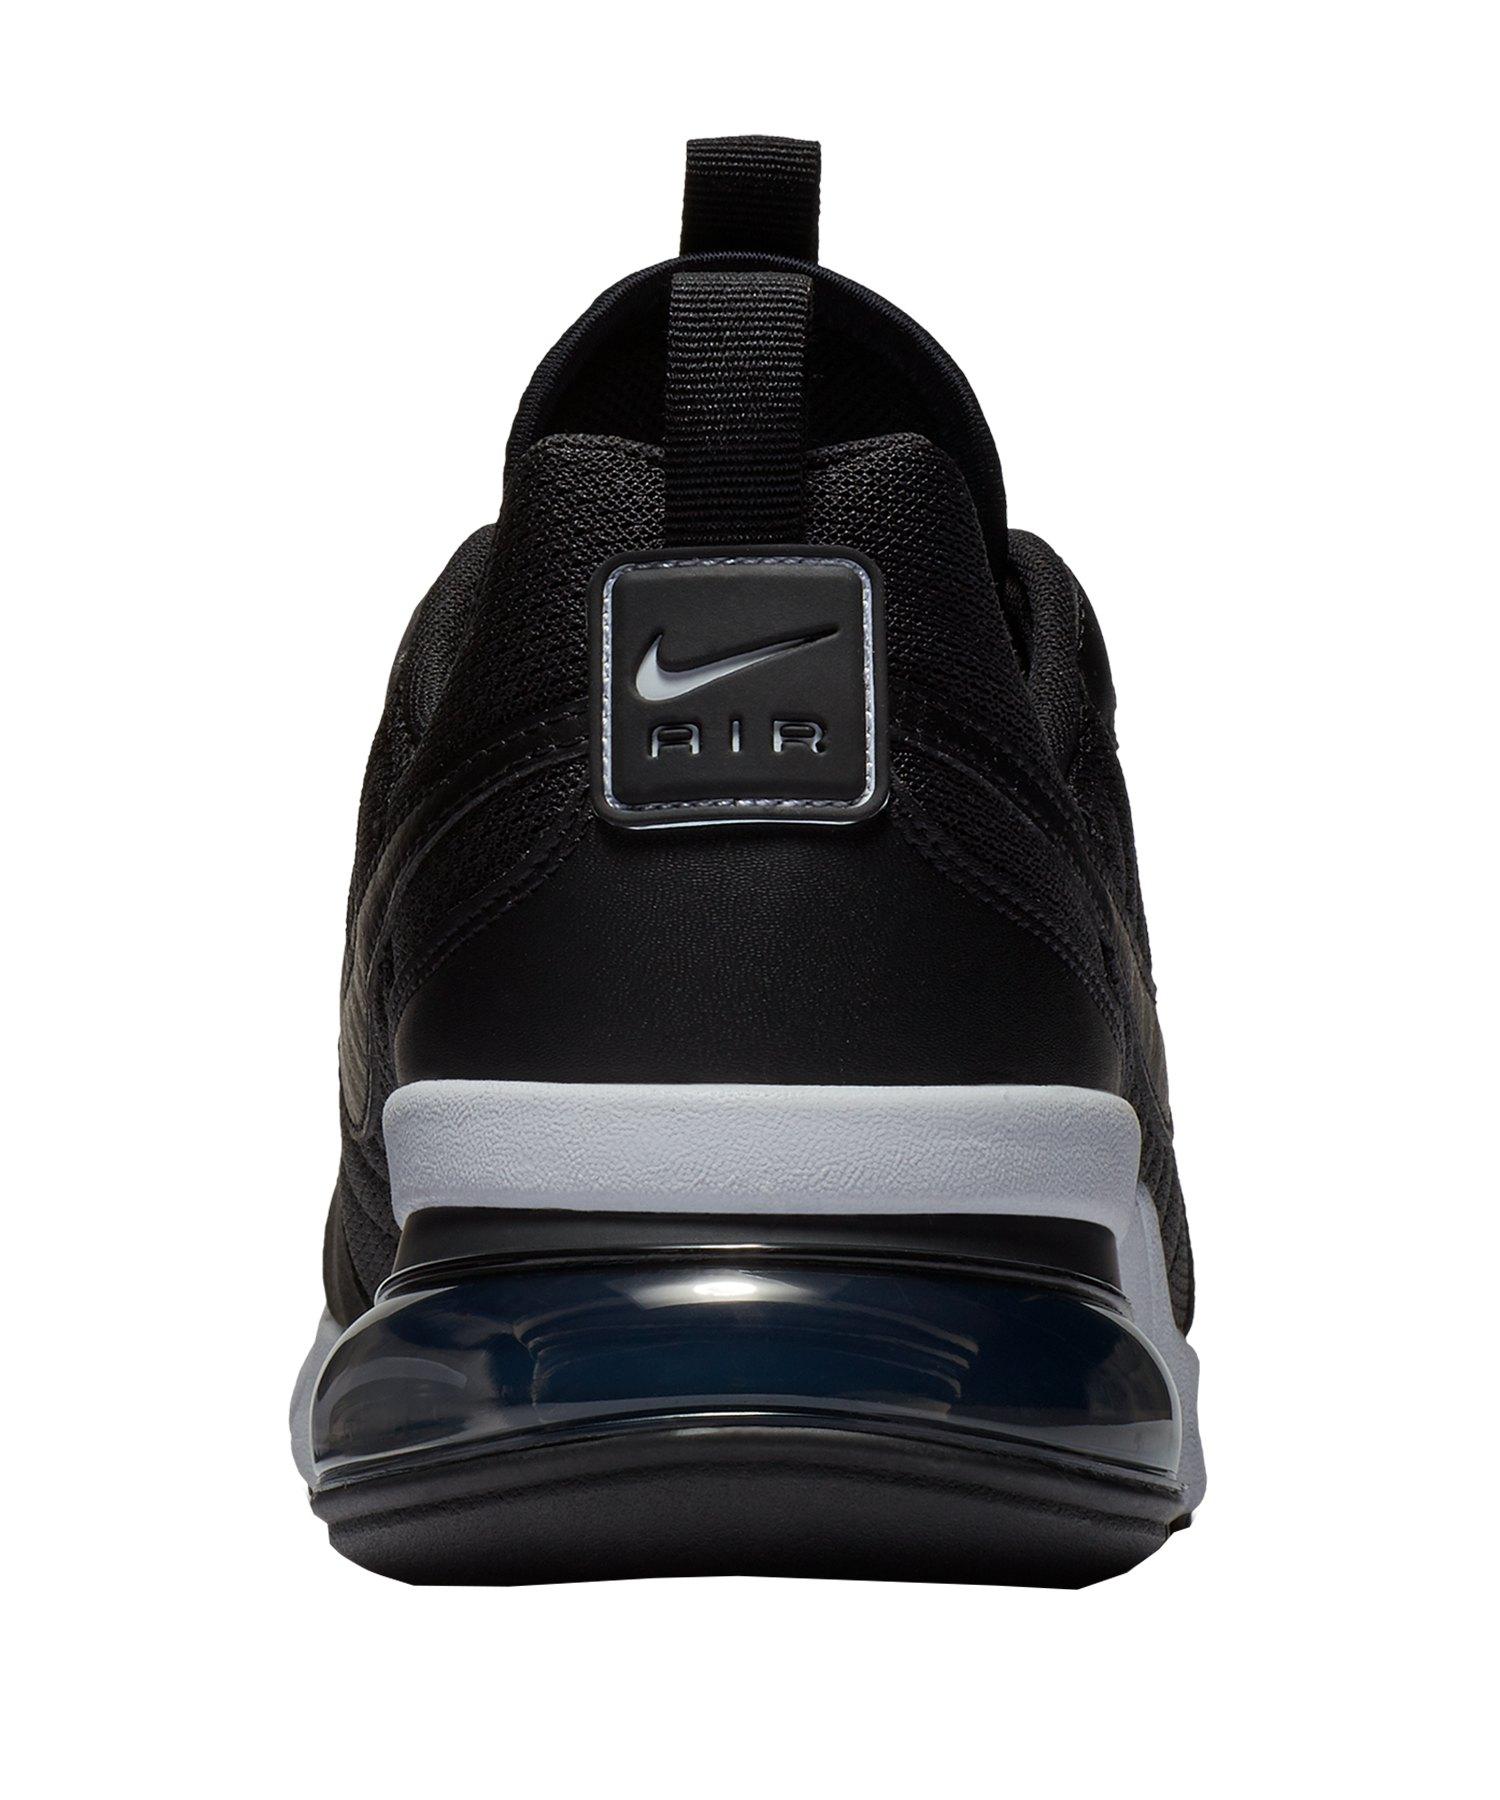 932c3c49a478d ... Nike Air Max 270 Futura Sneaker Schwarz Weiss F001 - schwarz ...